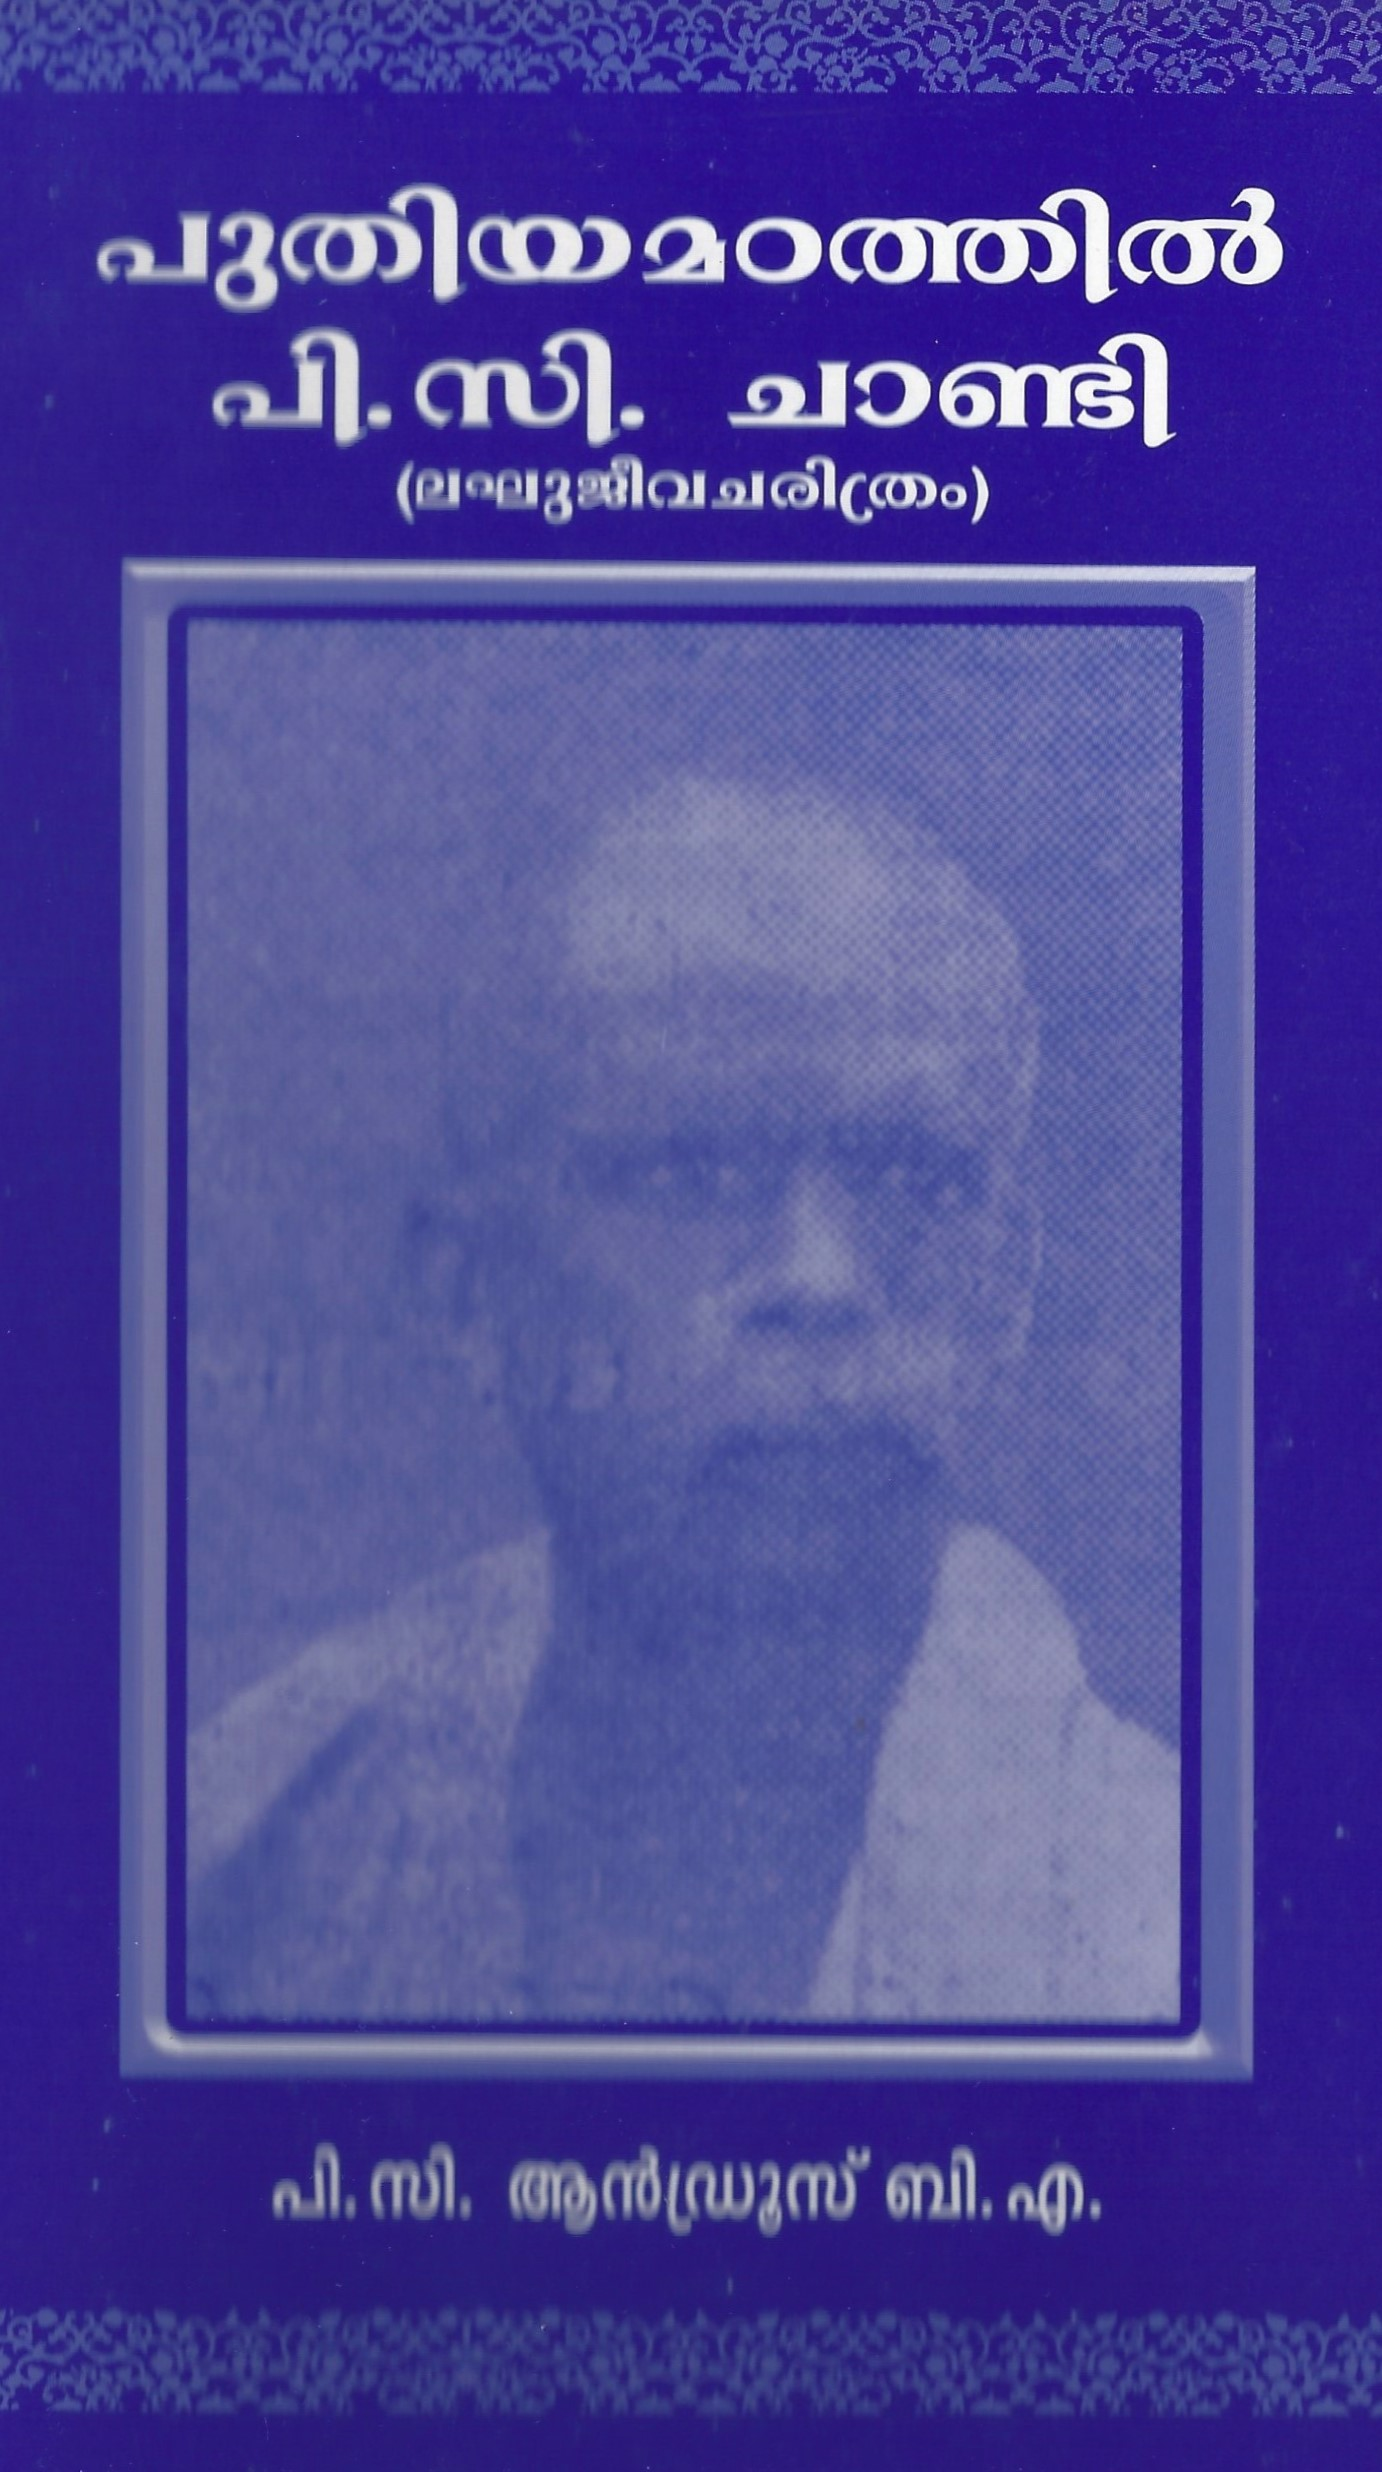 Puthiyamadathil P.C. Chandy (Short Biography)